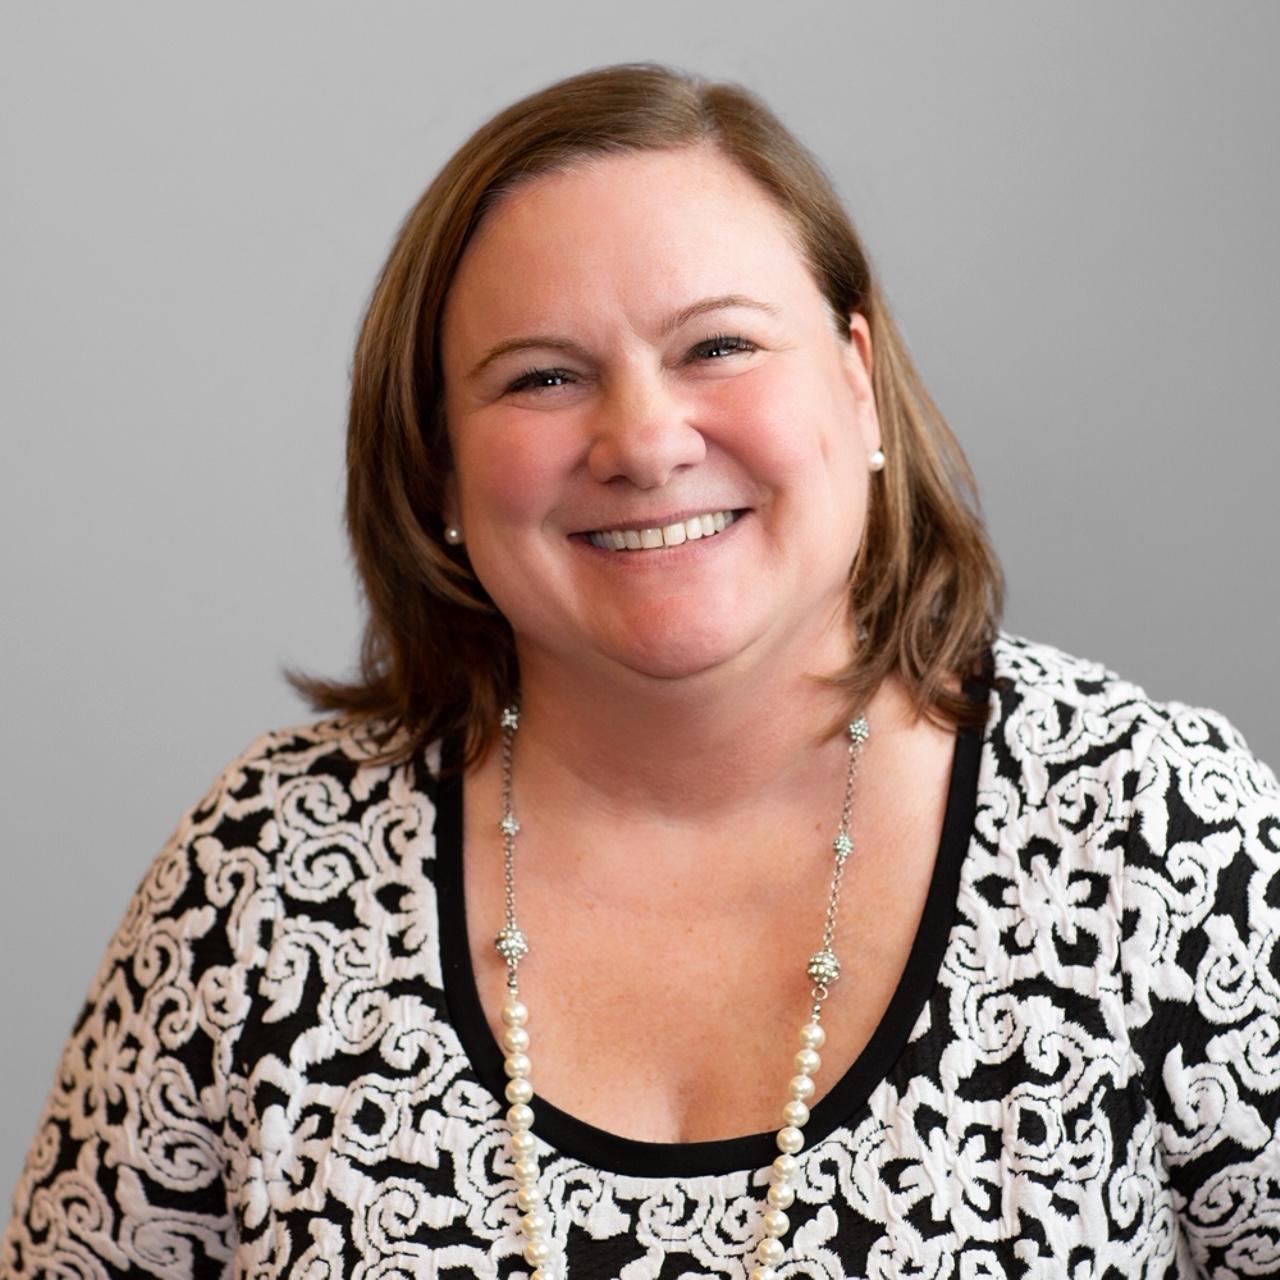 Trish Lilley - Chief Marketing & Business Development OfficerStroock & Stroock & Laven LLP